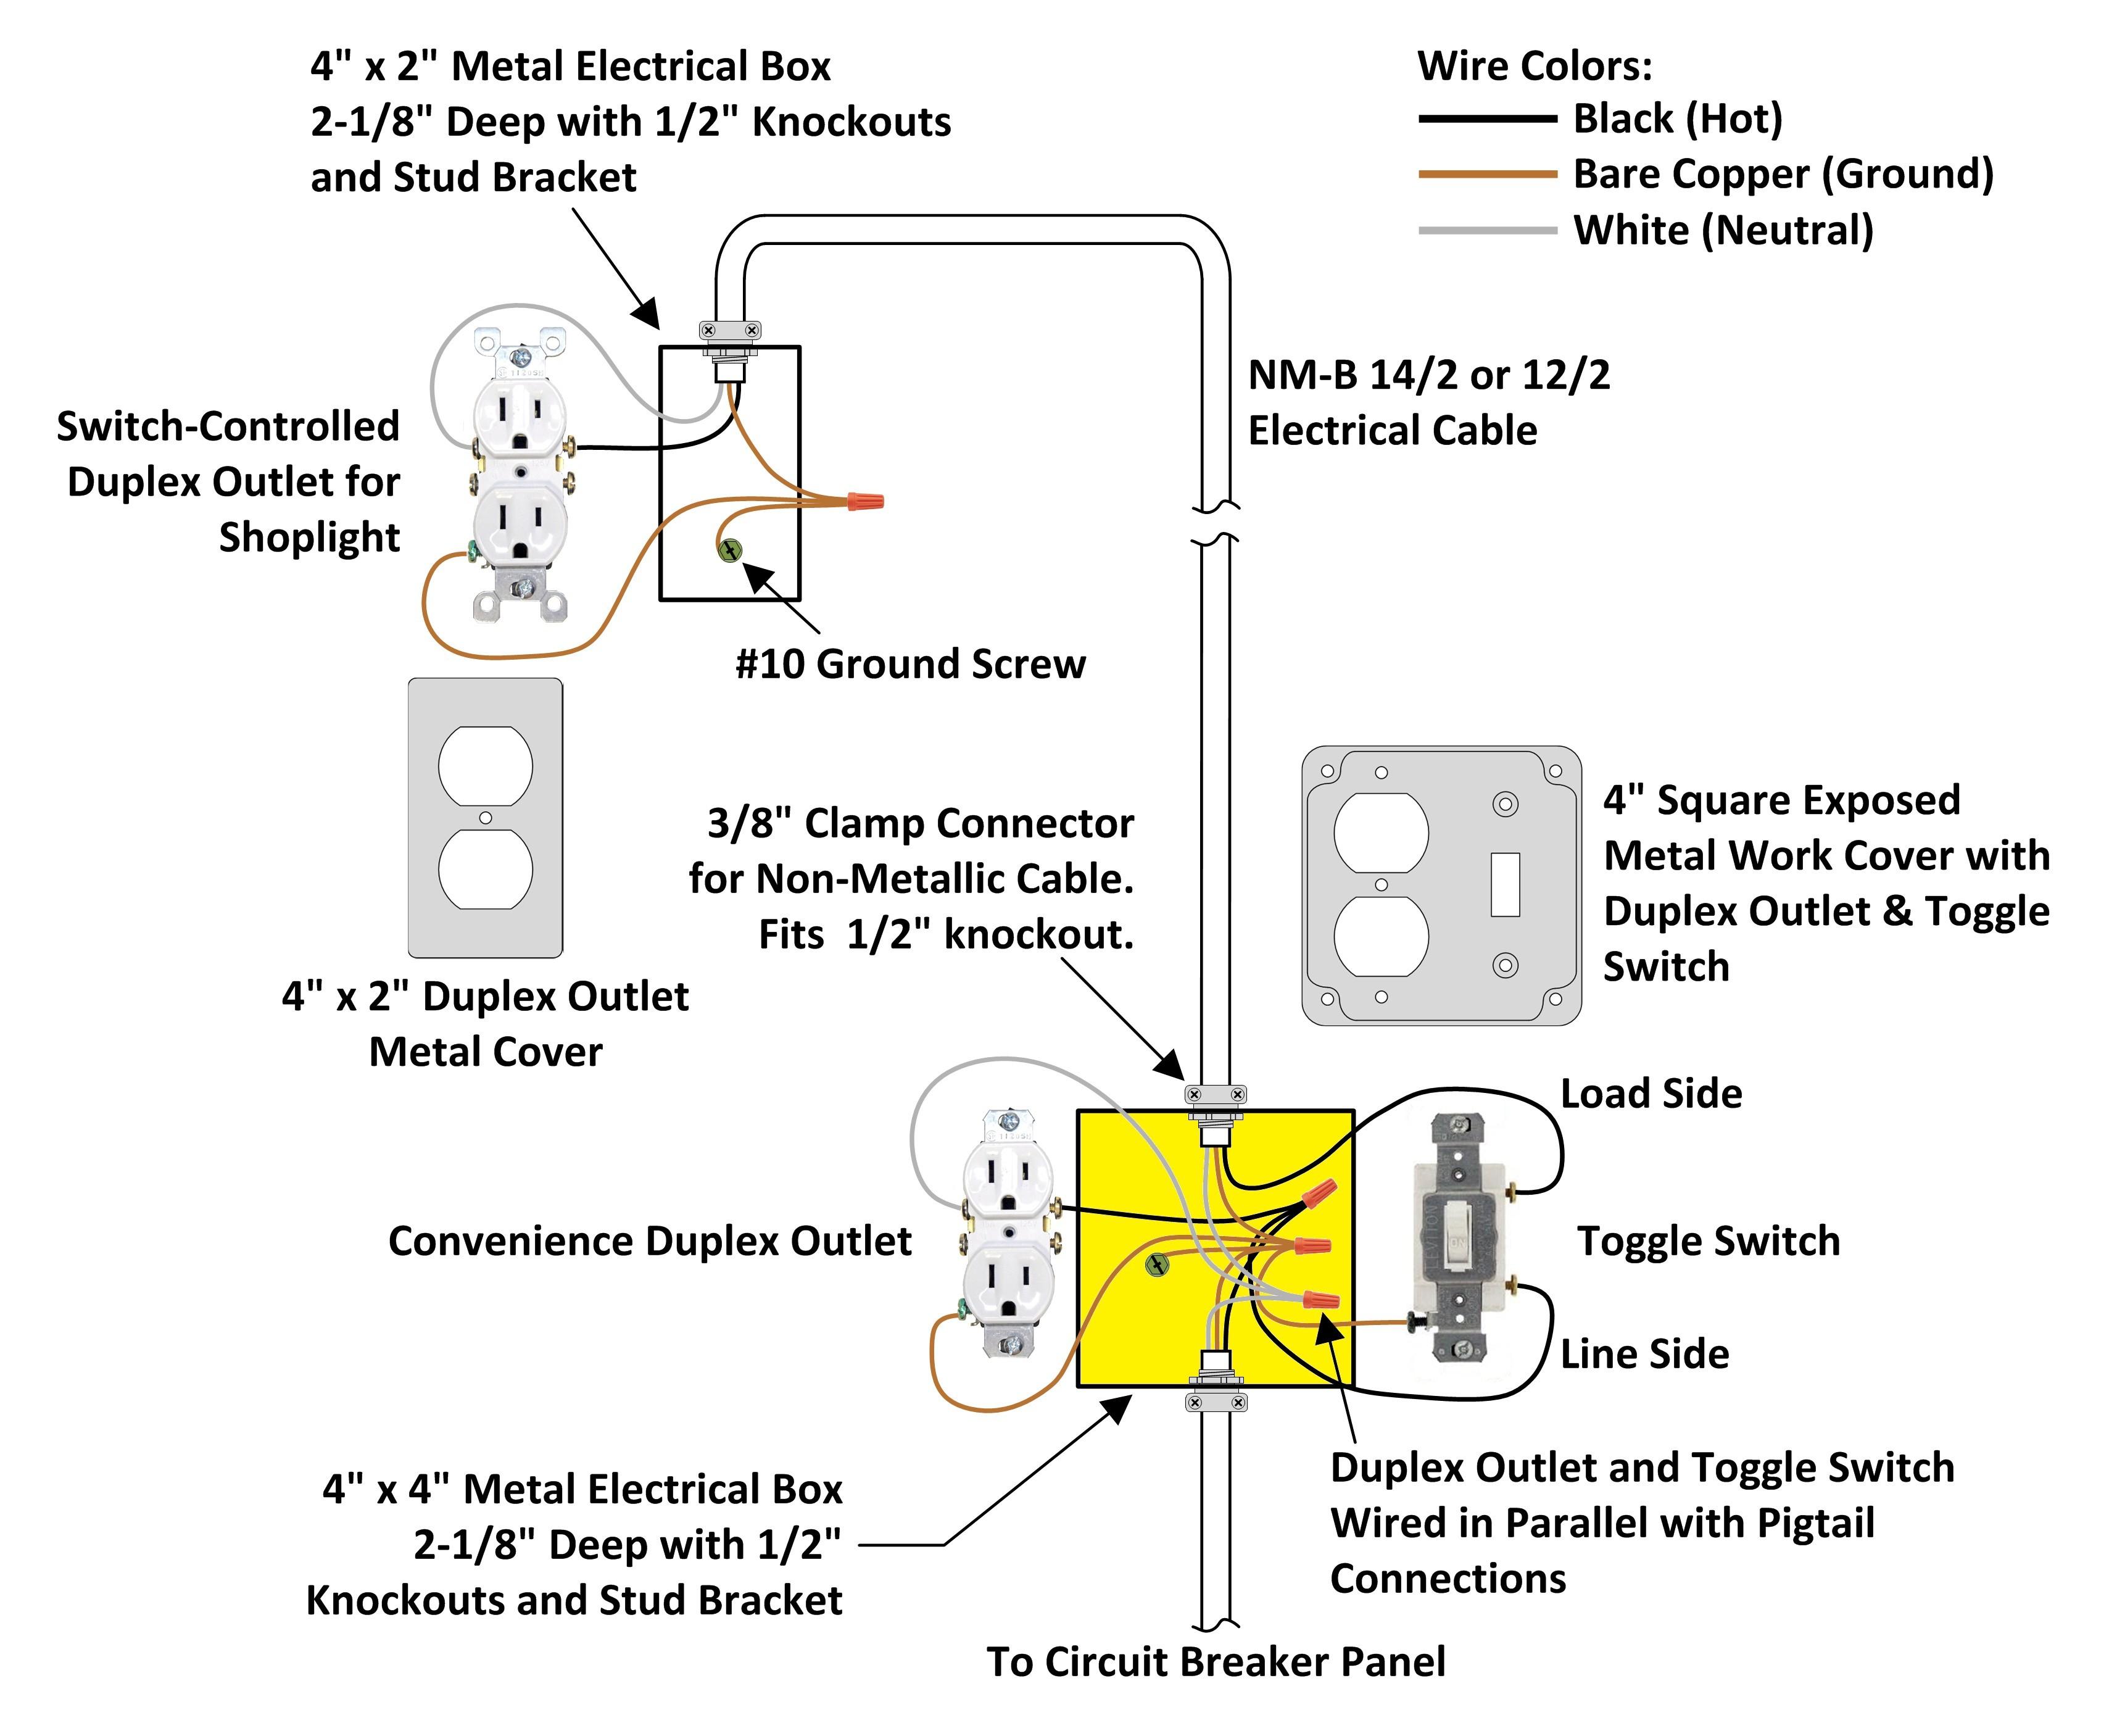 4 Prong Twist Lock Plug Wiring Diagram Elegant Cool L14 30 Plug Wiring Diagram Electrical and